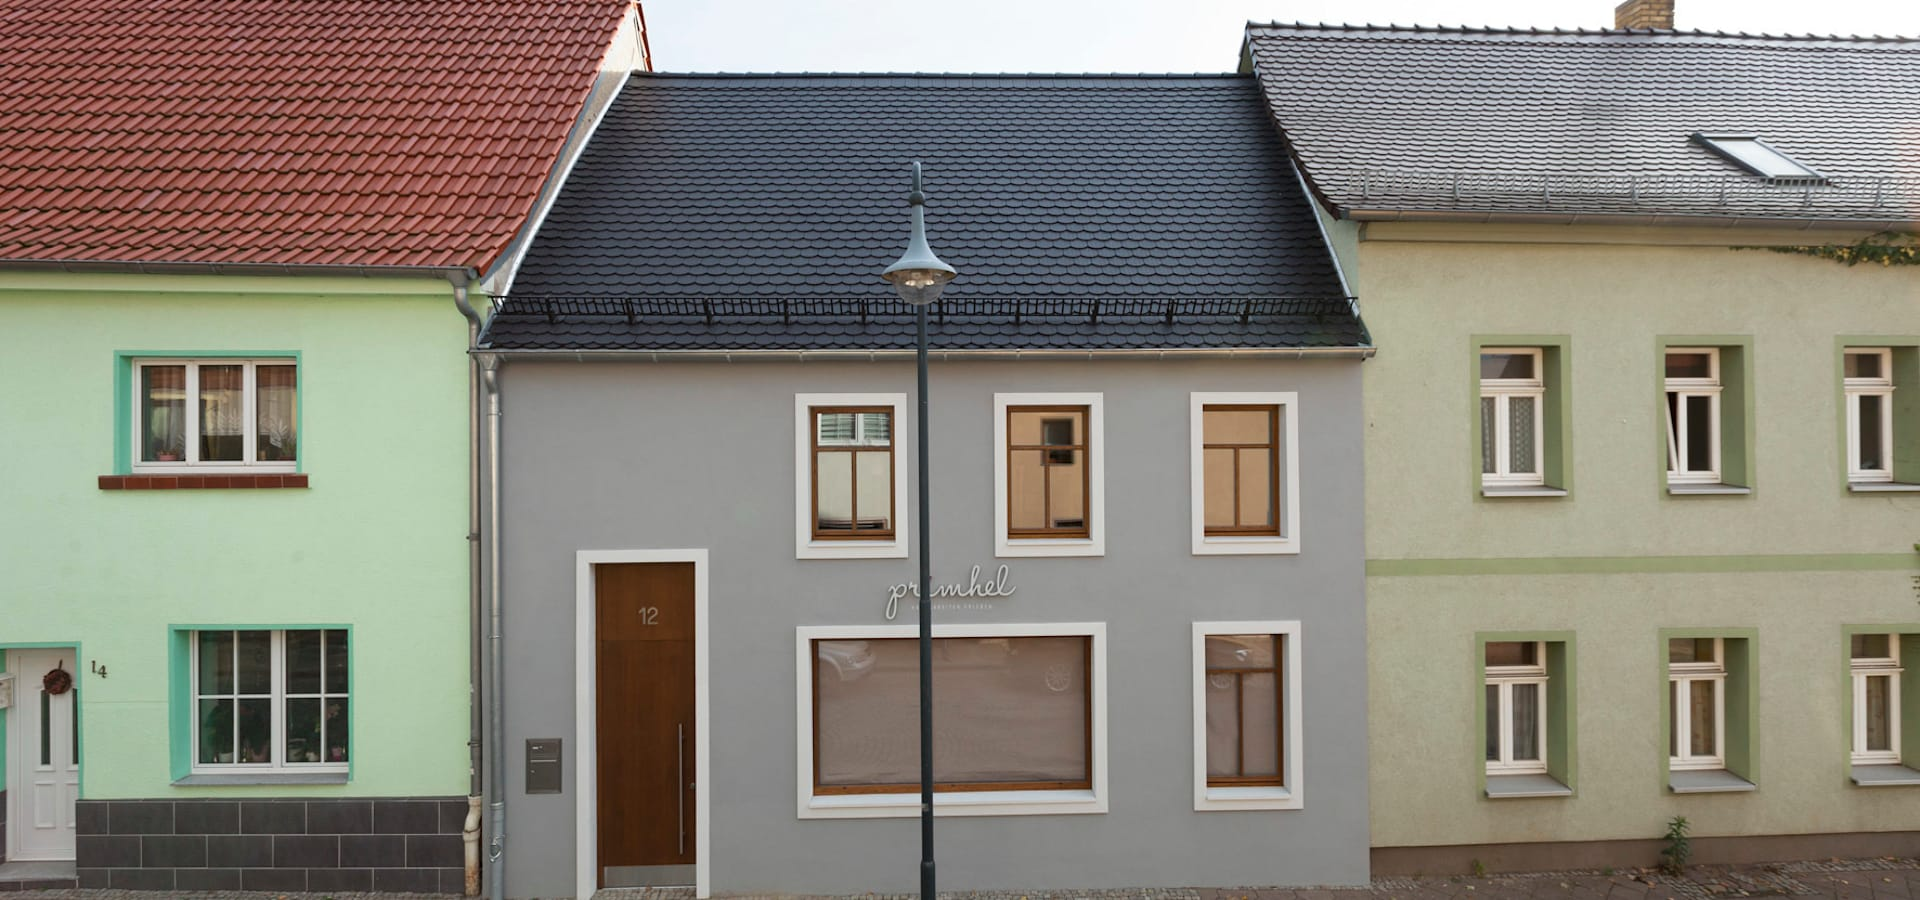 Bertram Bölkow Fotodesign